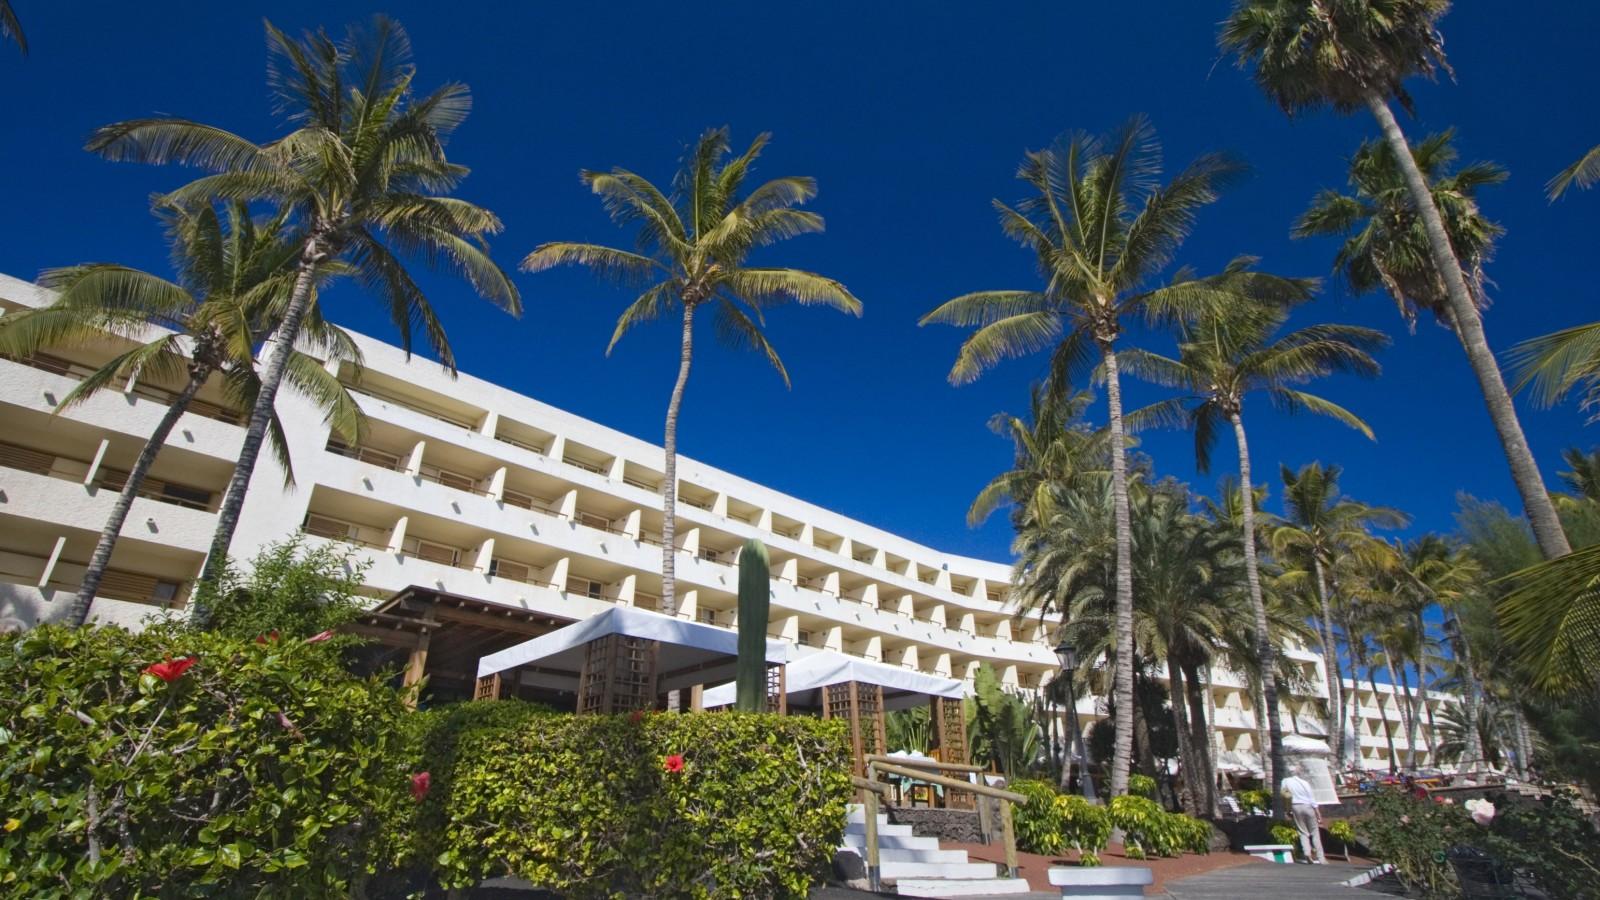 Previous next - Hotels in puerto del carmen ...